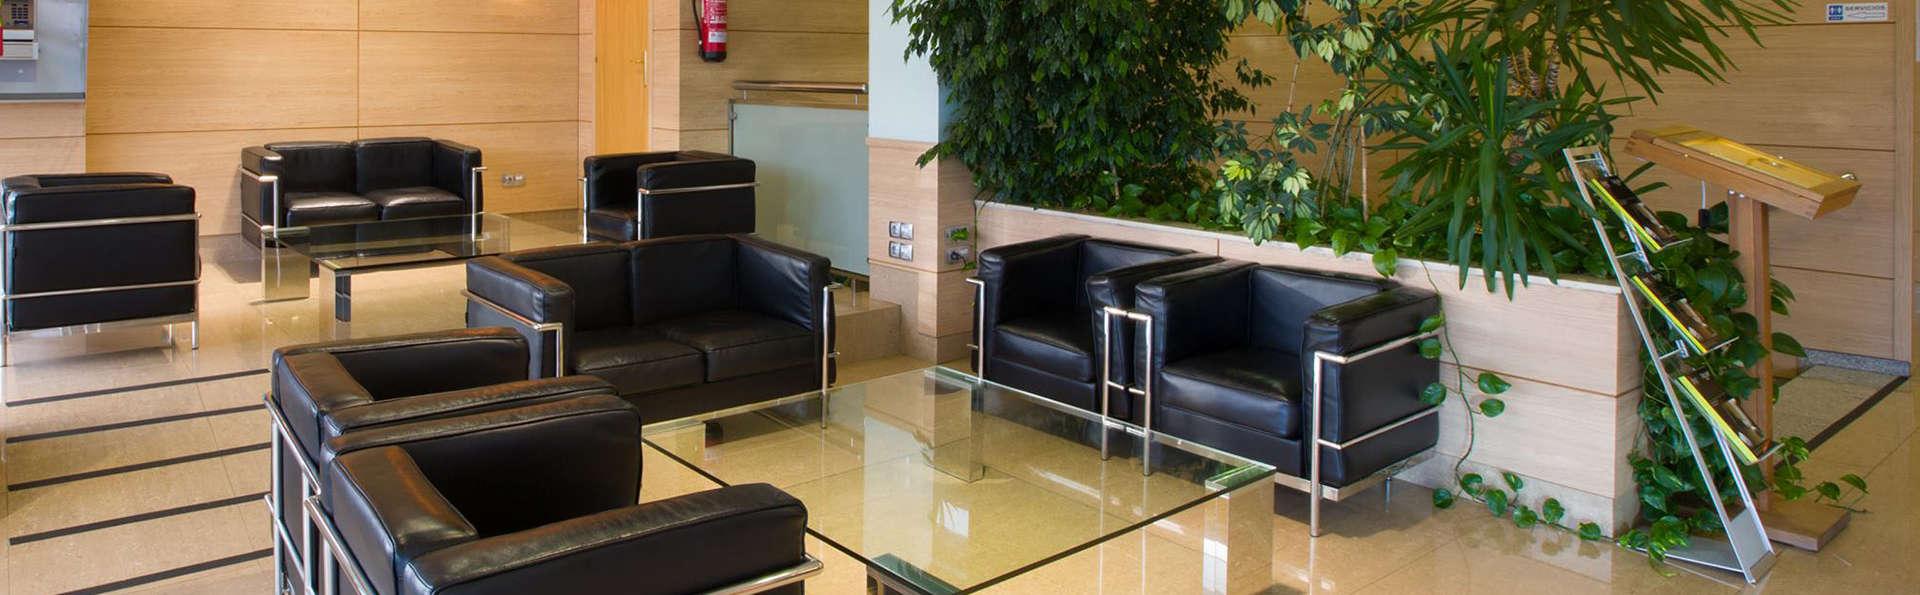 Hotel Sercotel La Boroña - EDIT_lobby.jpg